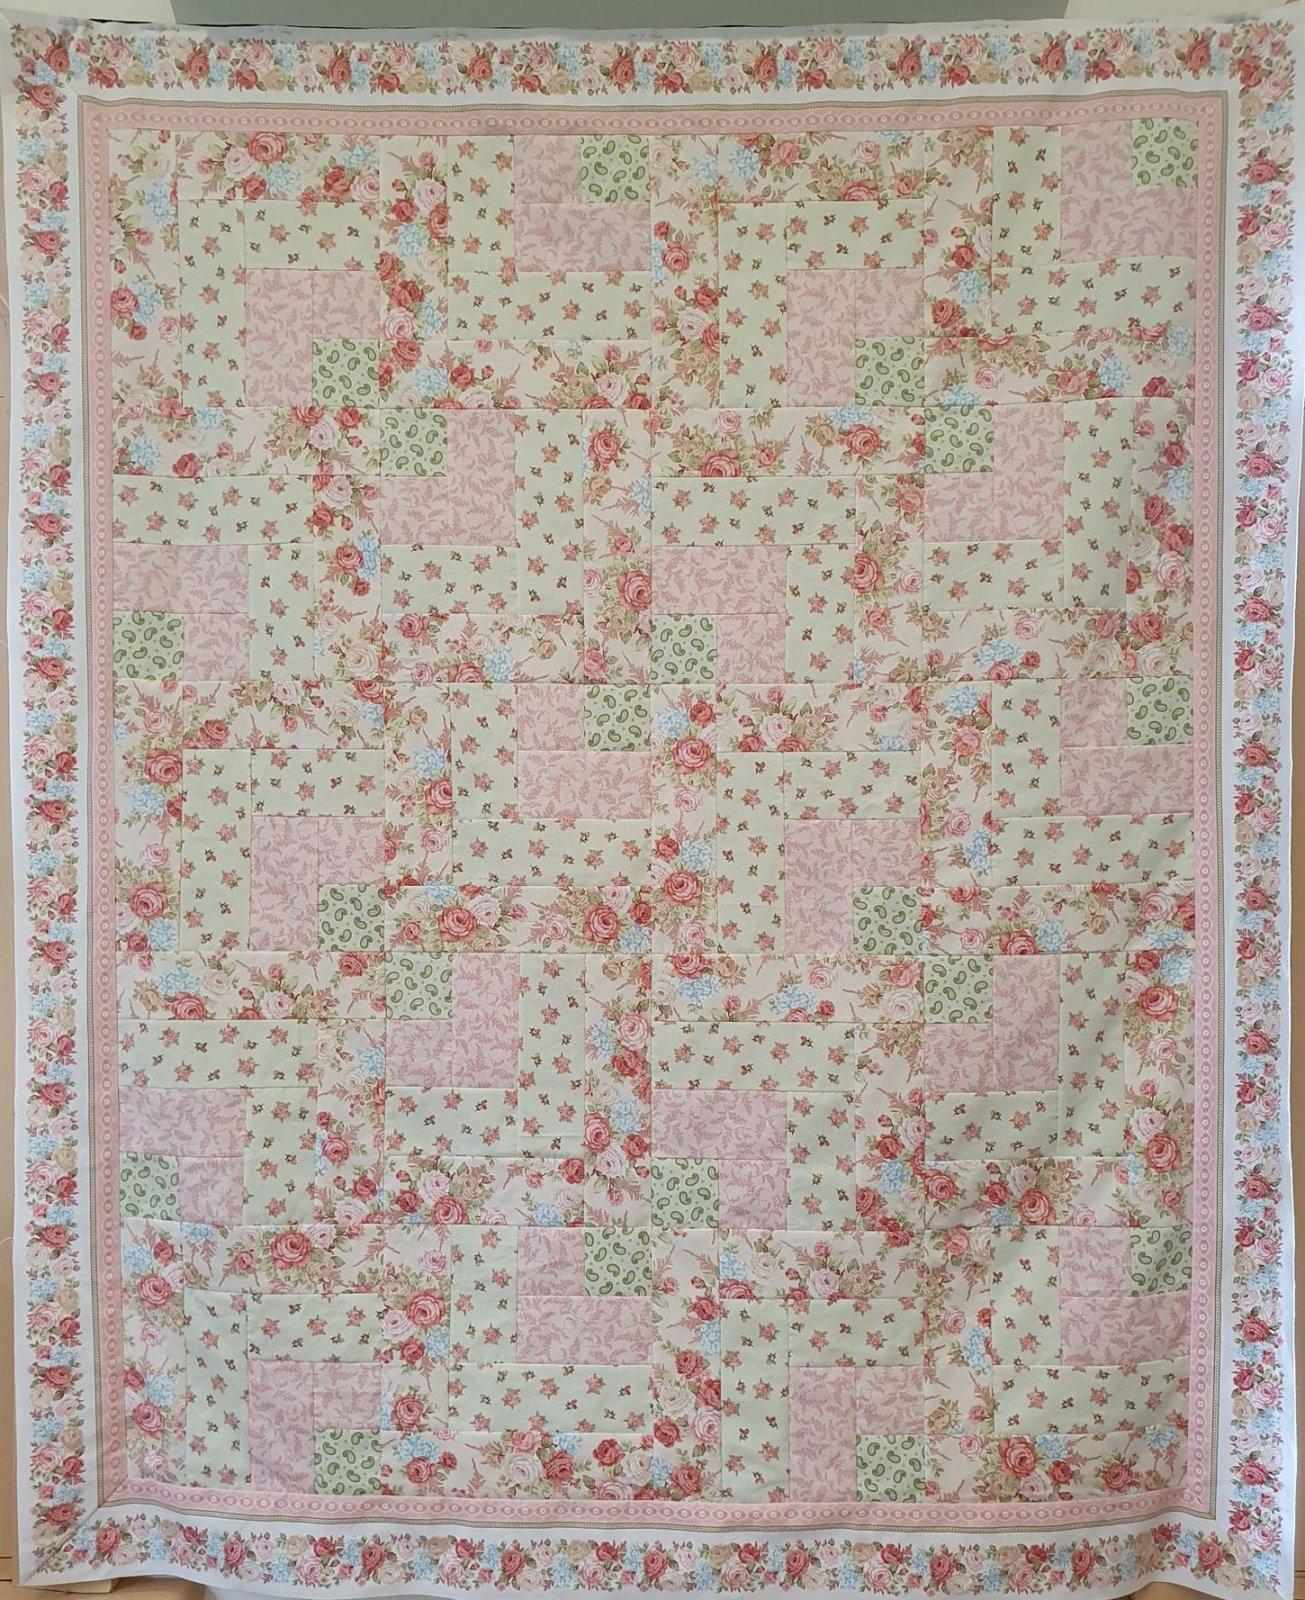 'Floral Cascade' Quilt Kit